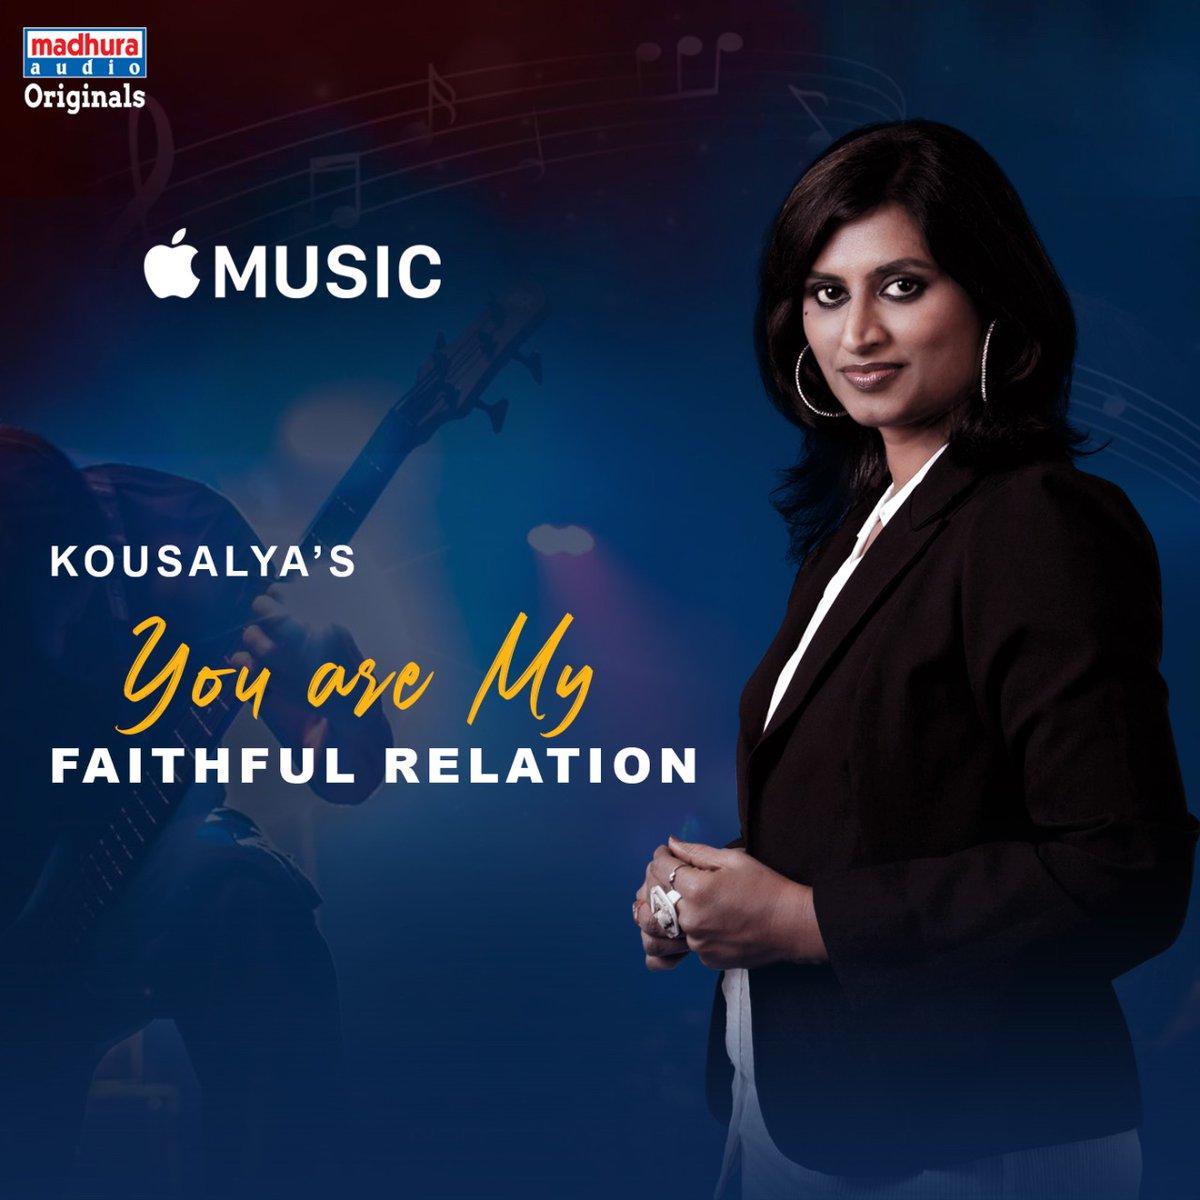 Talented Singer @KousalyaPotturi's #YouAreMyFaithfulRelation IS Streaming On Your Favorite OTT App  @AppleMusic: https://music.apple.com/in/album/you-are-my-faithful-relation-single/1518531301…pic.twitter.com/DXimZnoiR5